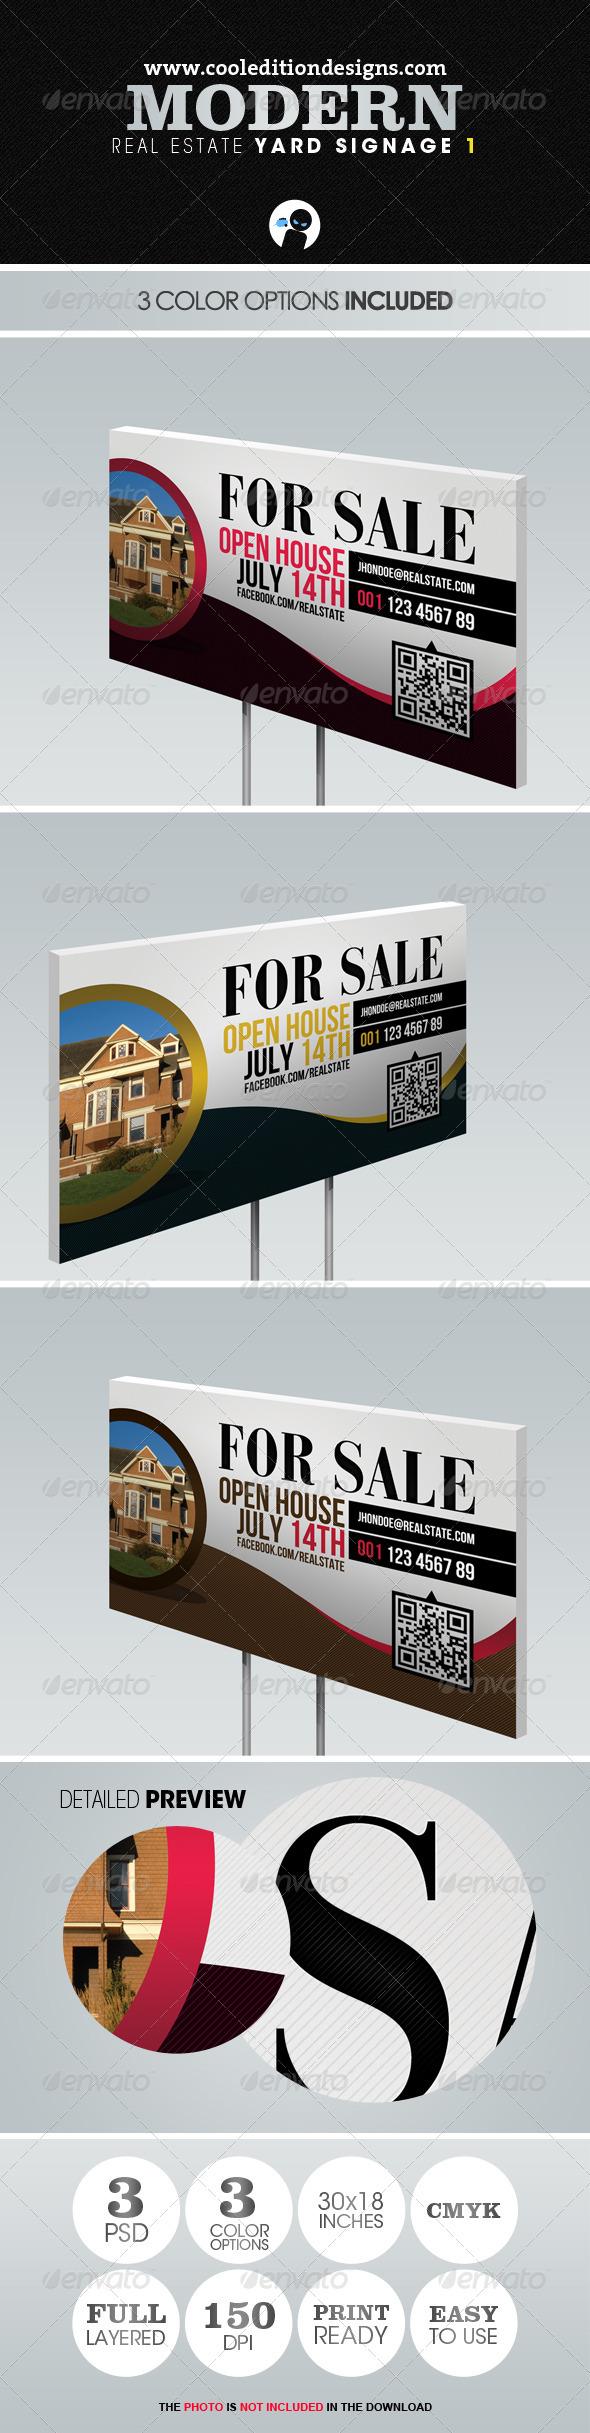 GraphicRiver Modern Real Estate Yard Signage 1 2410929